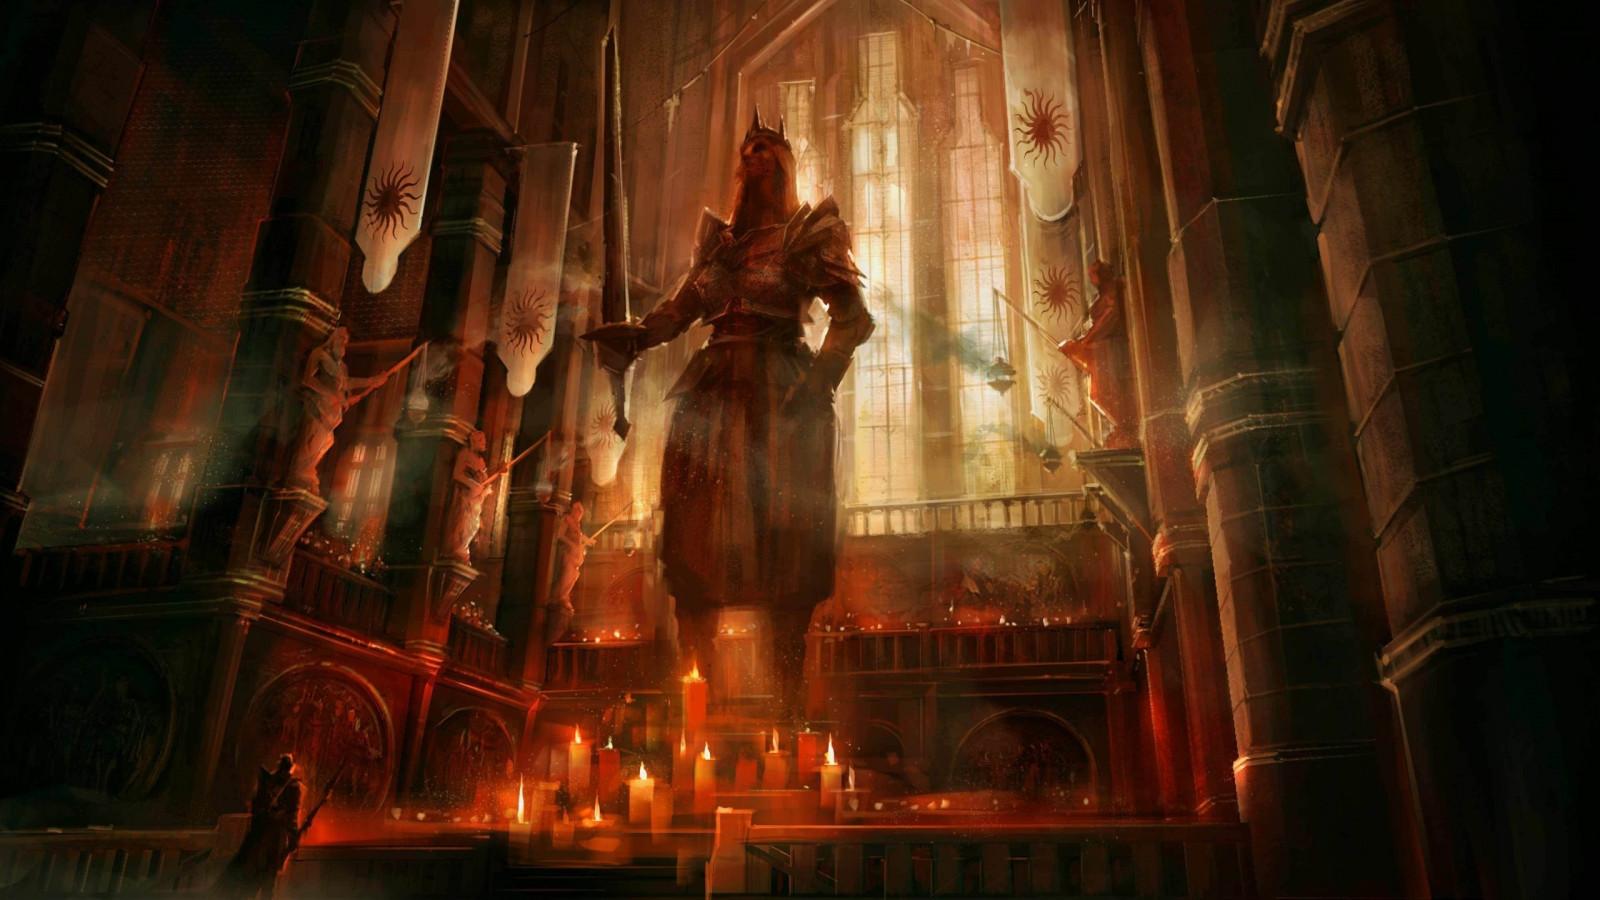 https://c.wallhere.com/photos/75/fe/Dragon_Age_II_Dragon_Age_fantasy_art_concept_art_video_games_candles_statue_temple-123221.jpg!d